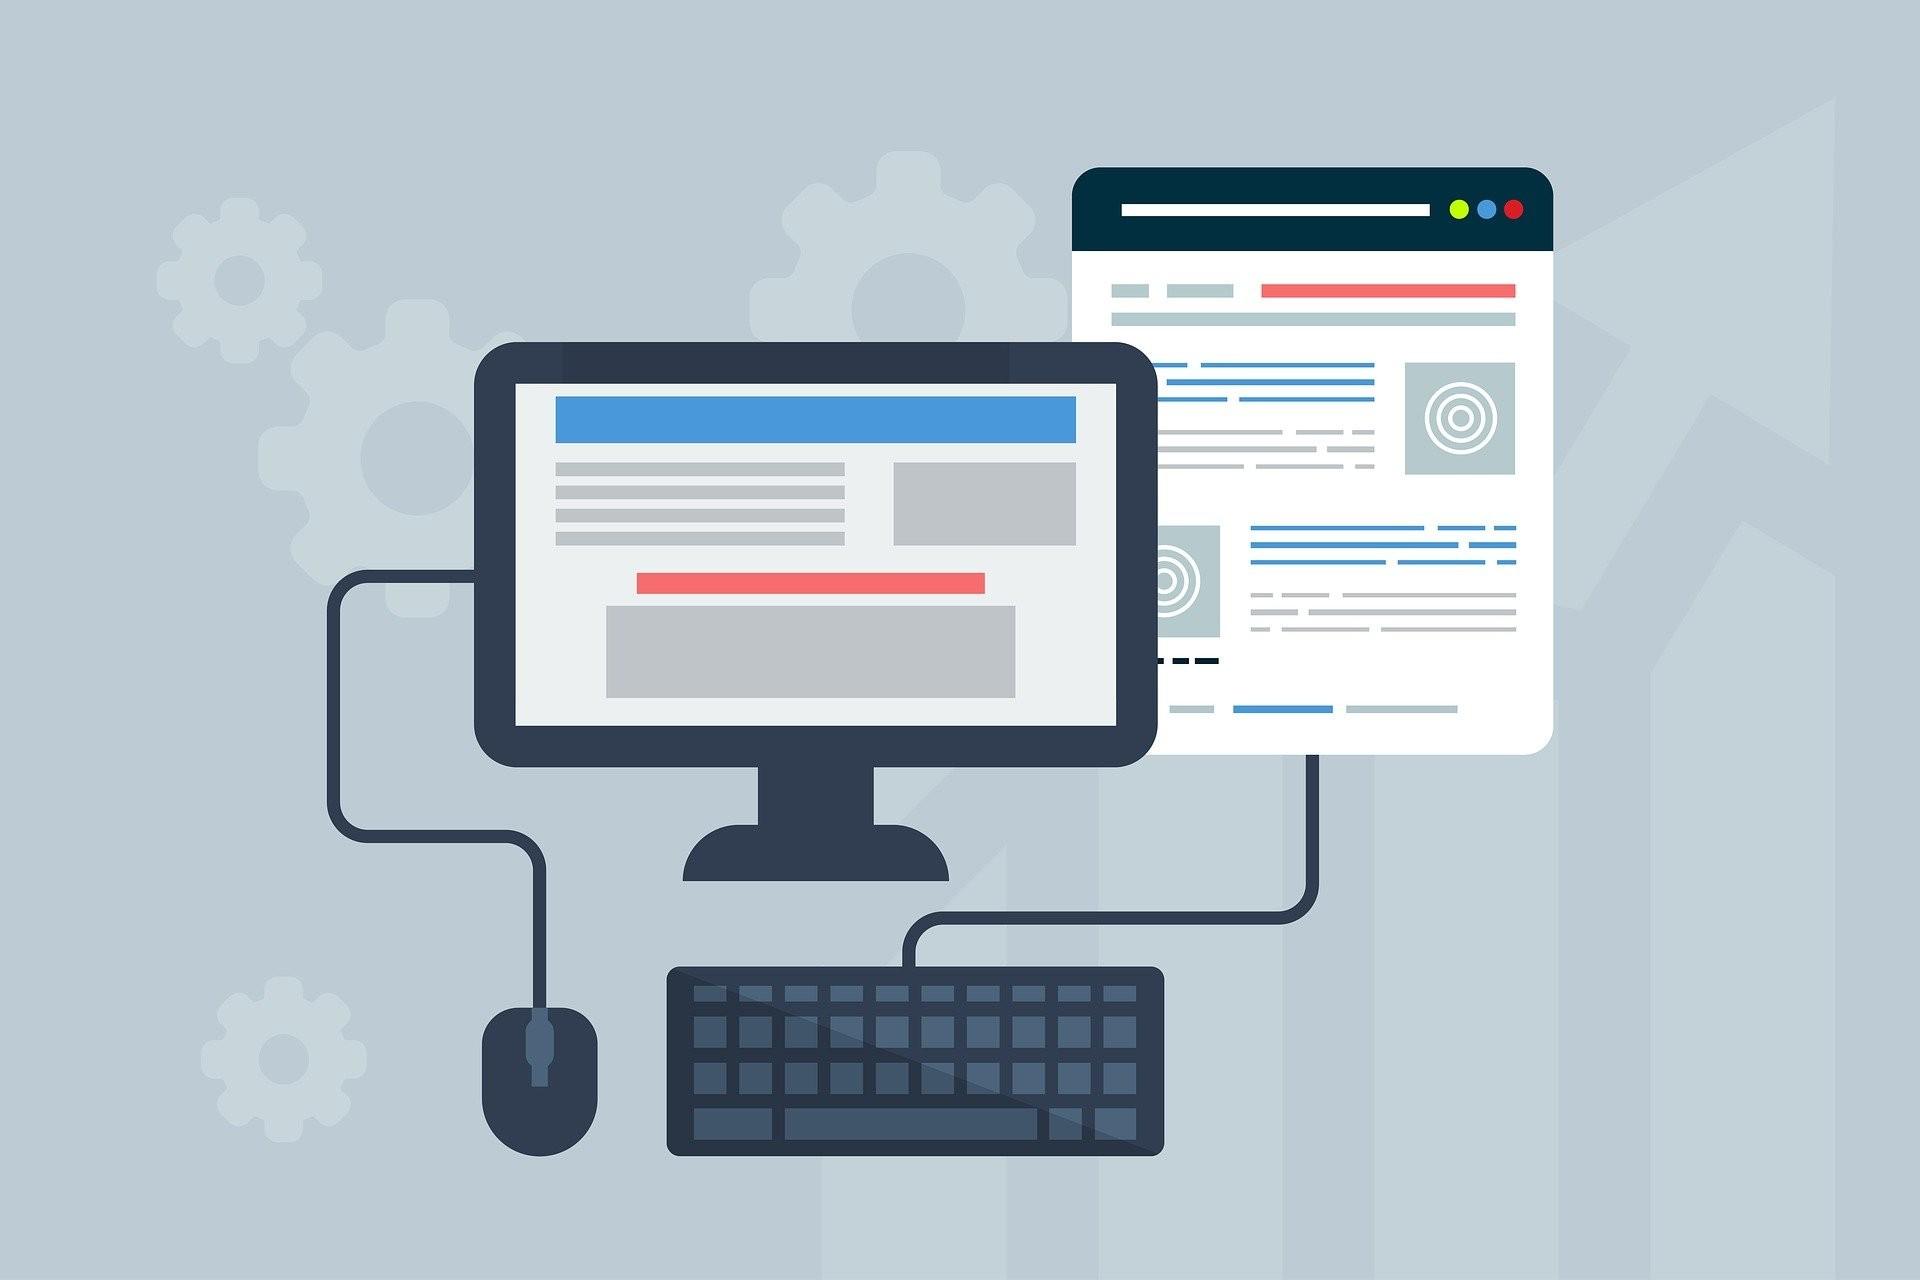 HappyWeb.ro | Web development | Presentation website | Web design, web development, online marketing